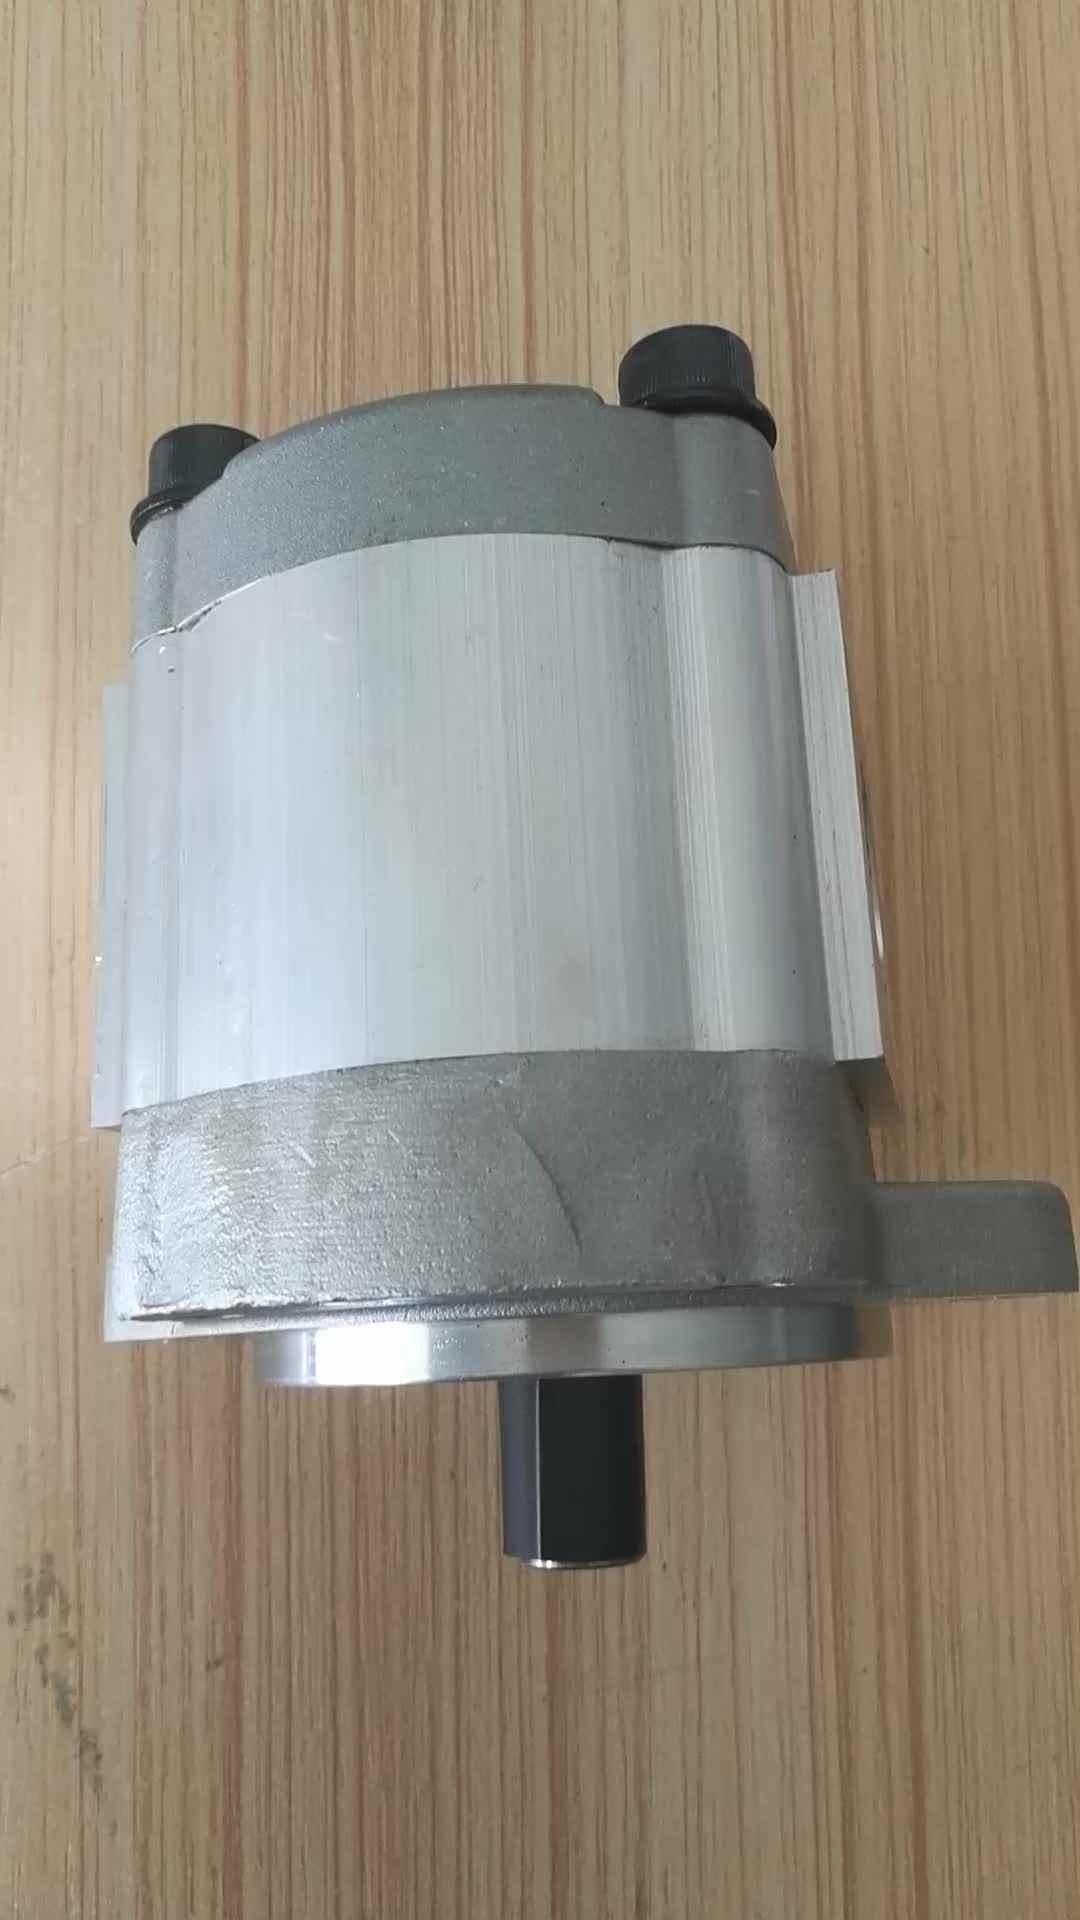 hgp gear pumps high pressure gear pump hydraulic pumps for log splitter